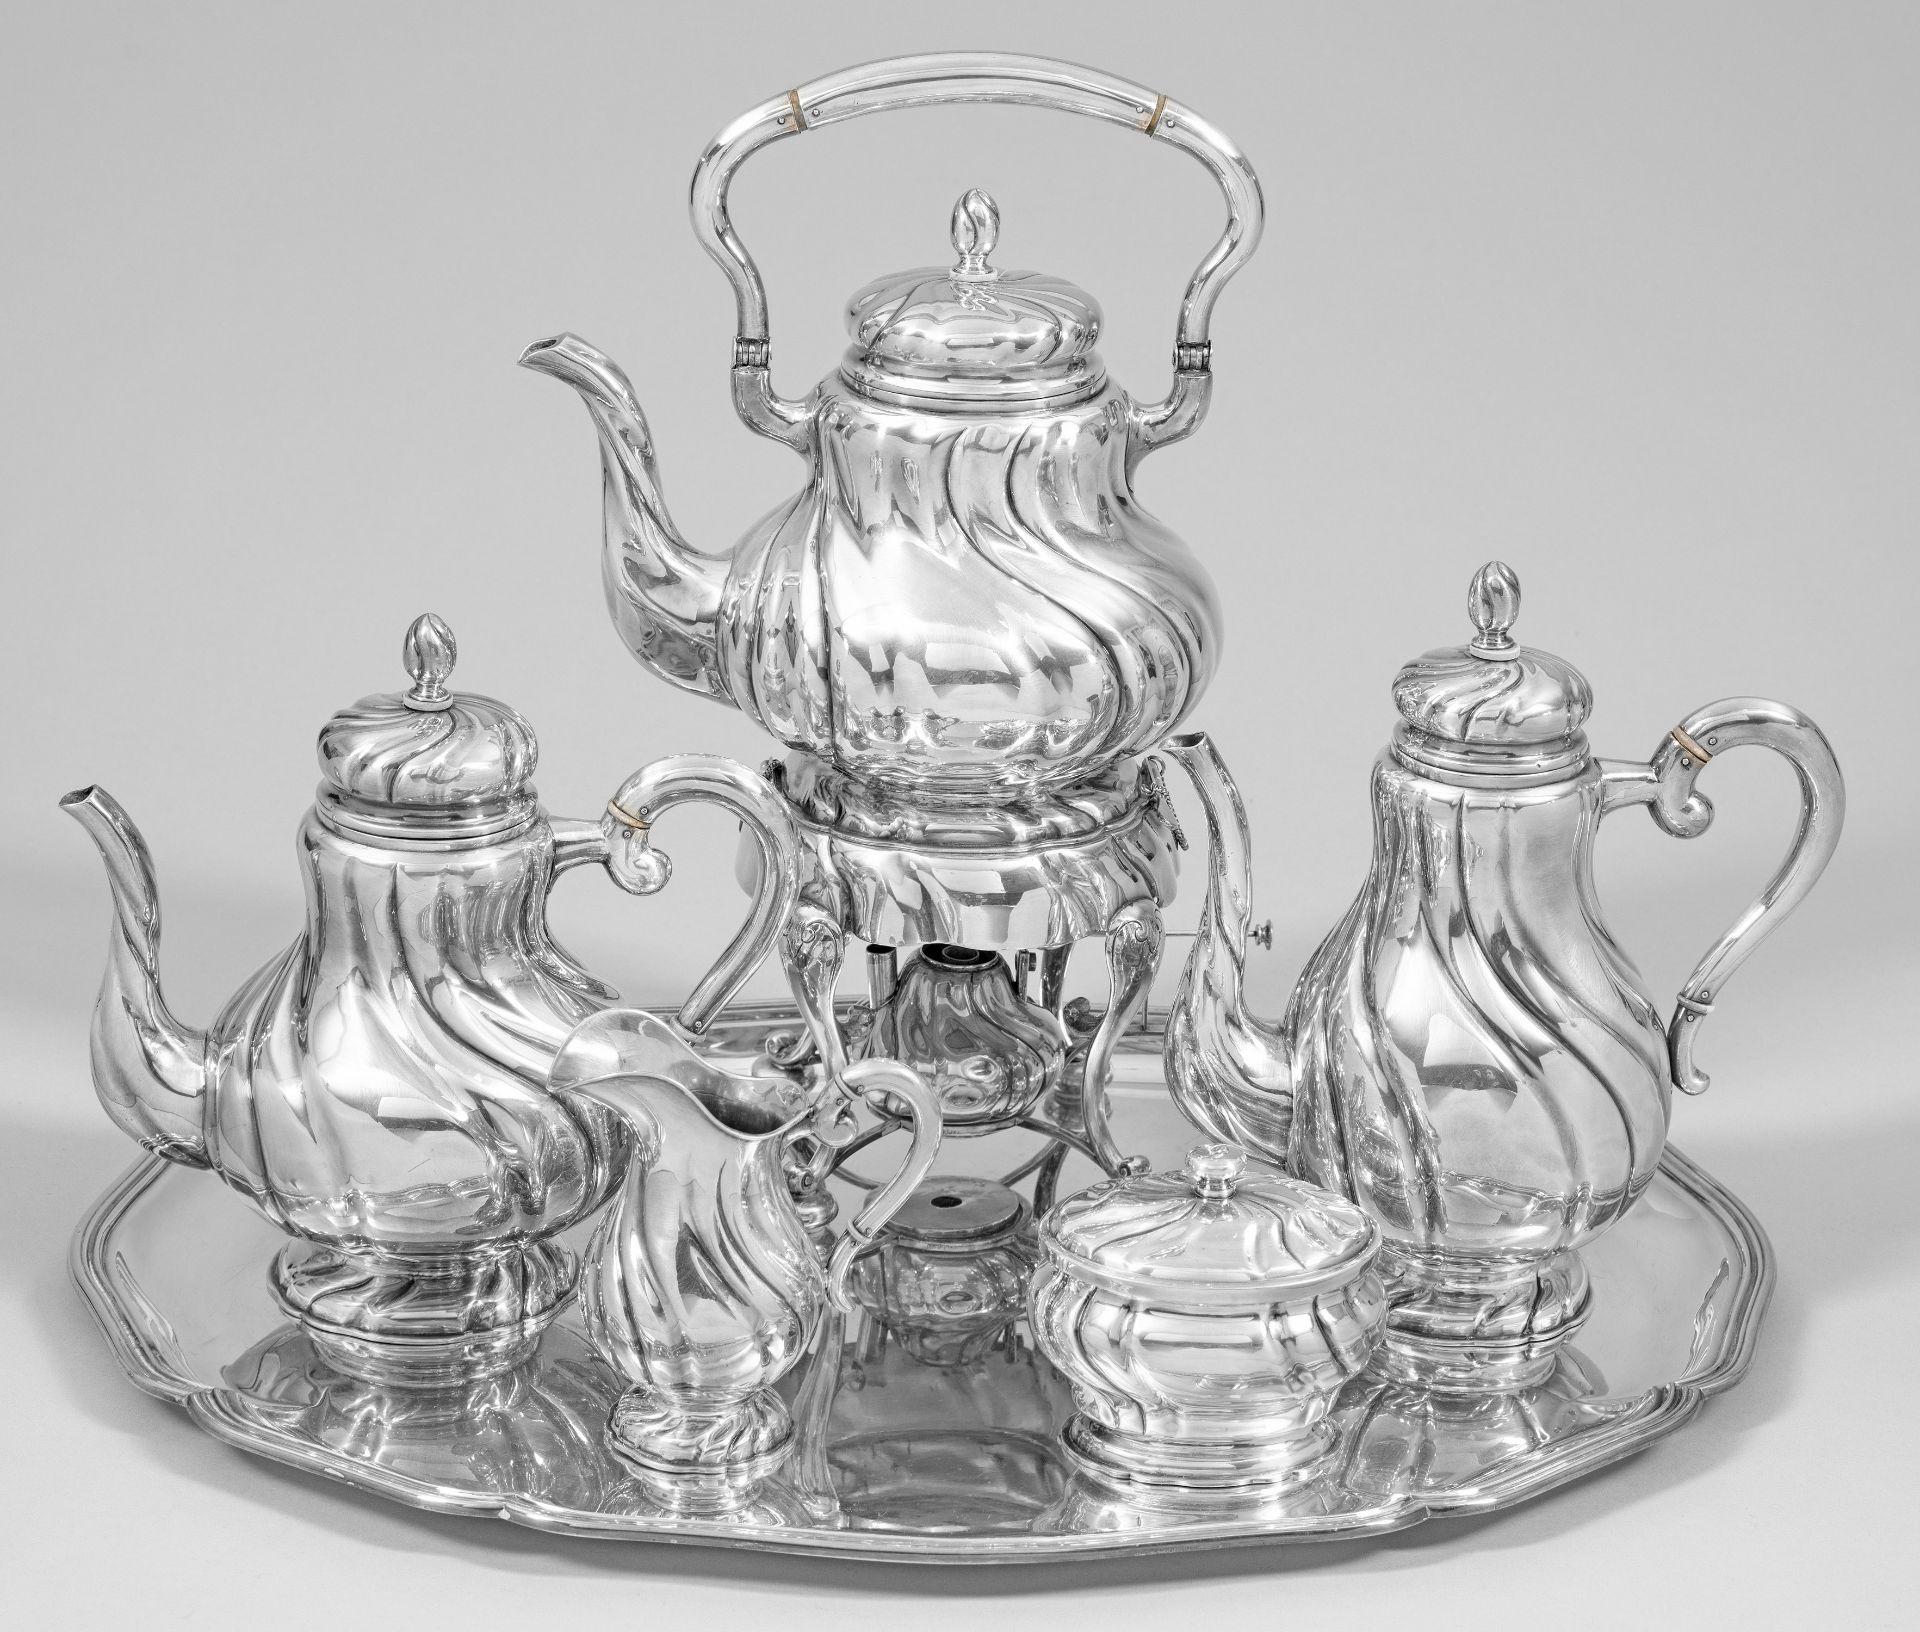 Großes Kaffee- und Teeservice im Barockstil